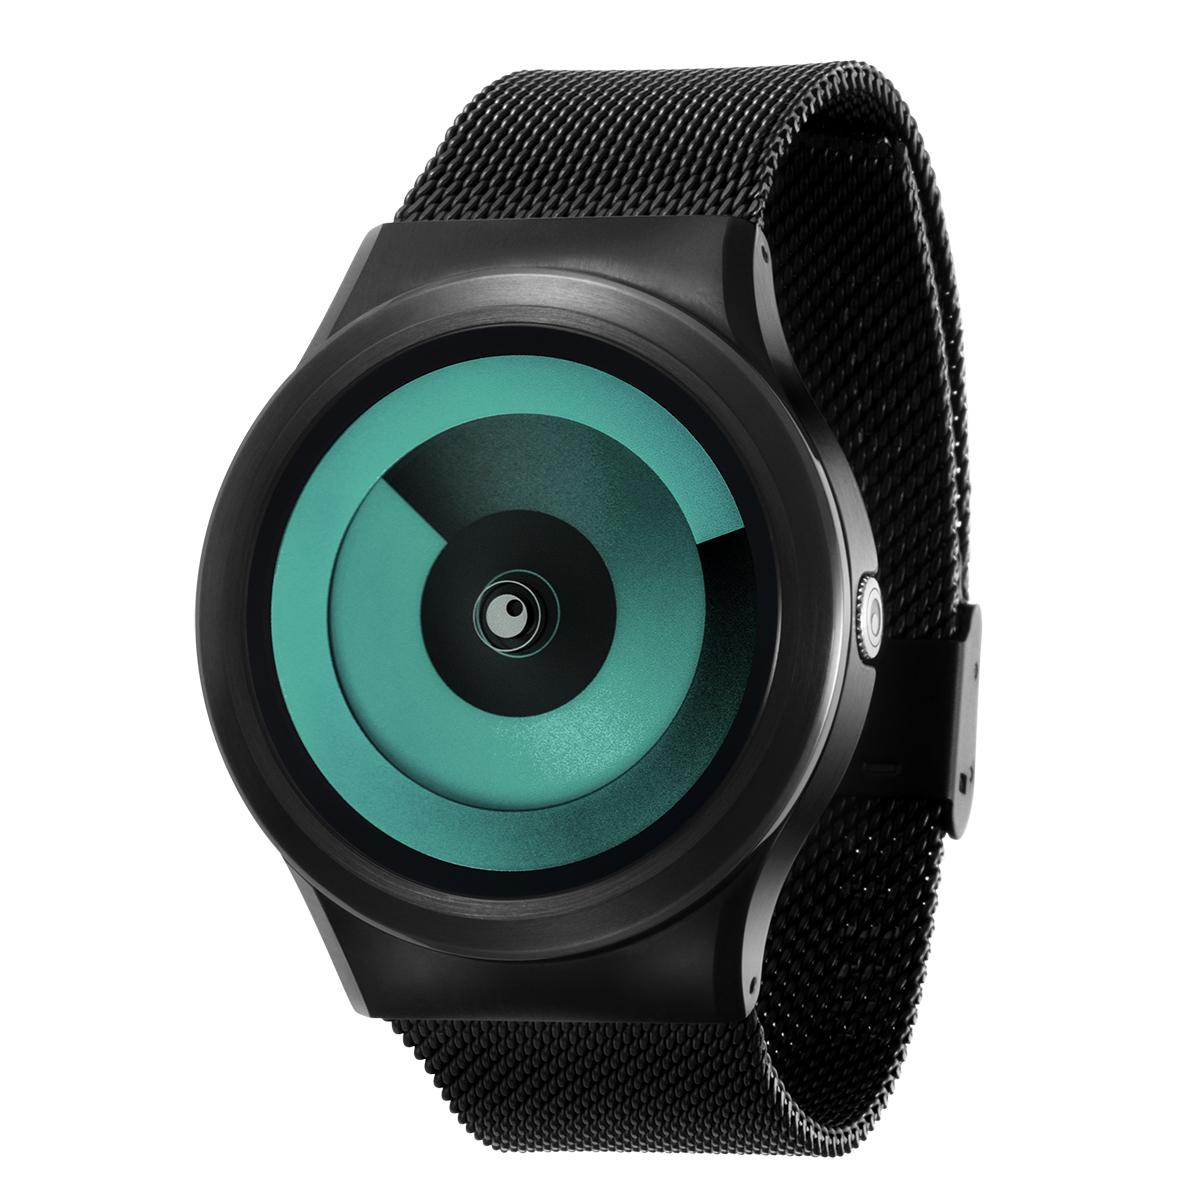 3500853257 ... ZEROOSPIRALGALAXYゼロ電池式クォーツ腕時計[W06018B03SM03]グリーン ZEROOSPIRALGALAXY ...